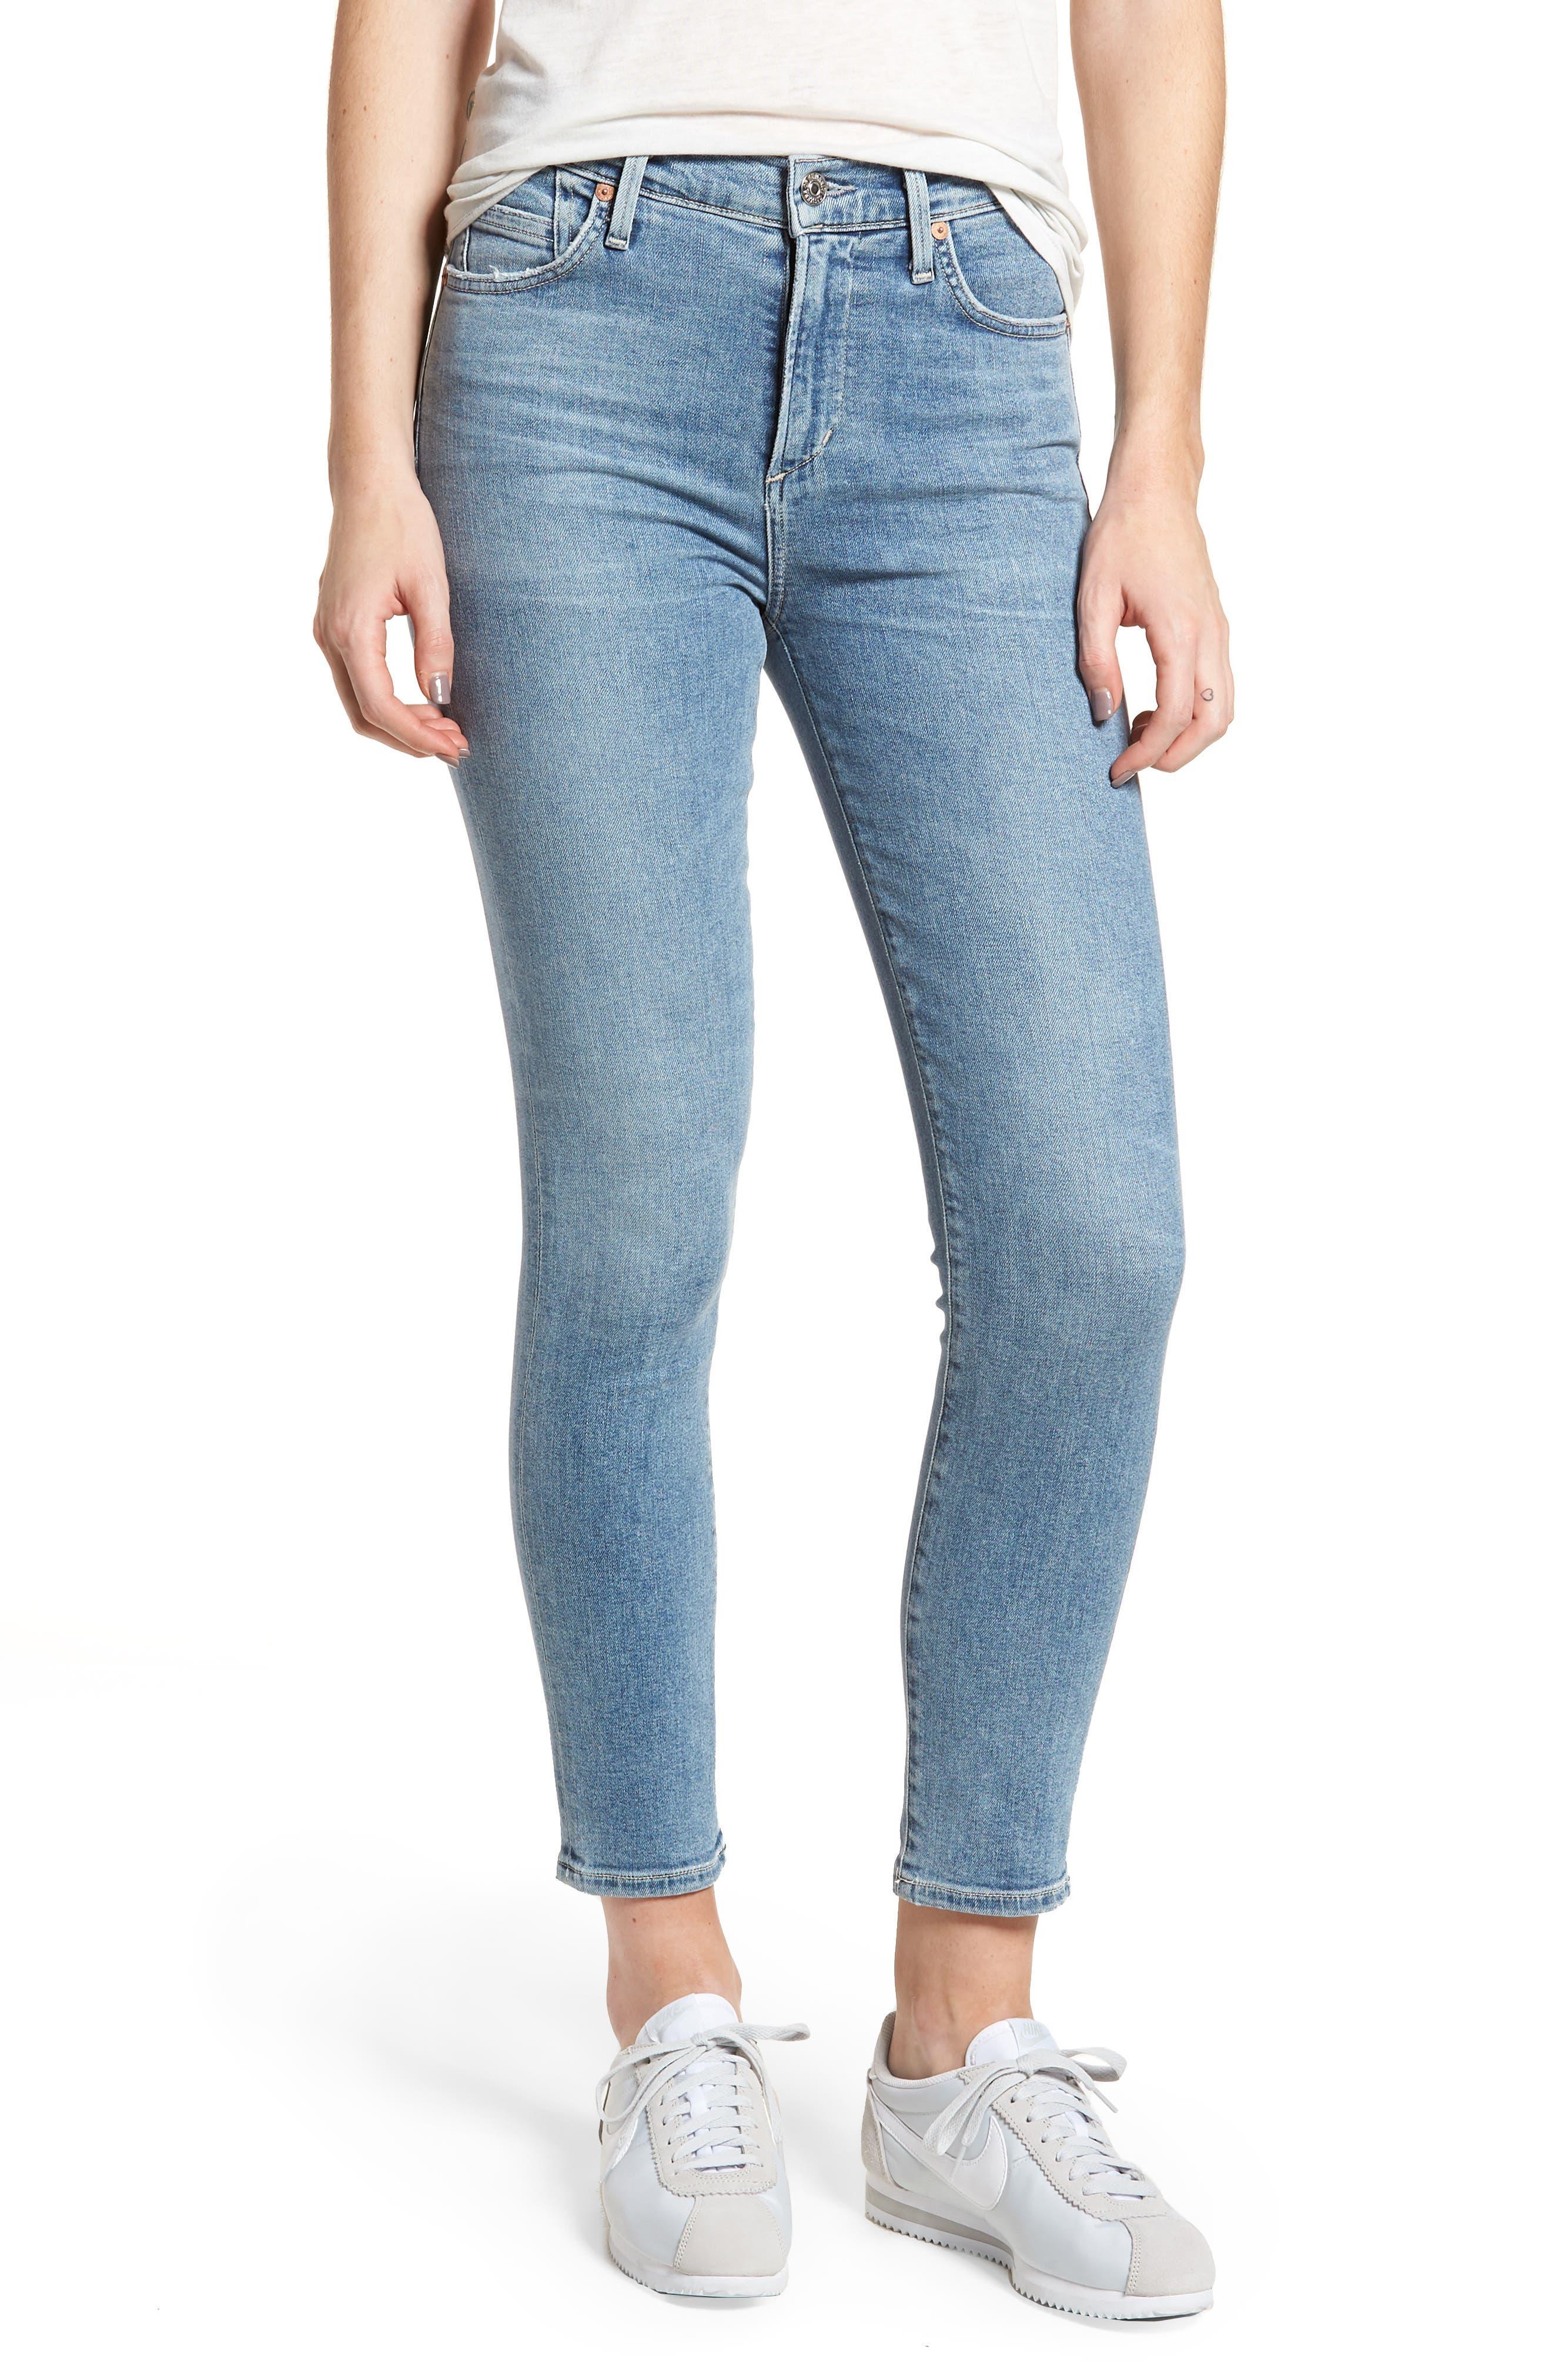 Rocket High Waist Crop Skinny Jeans,                             Main thumbnail 1, color,                             457